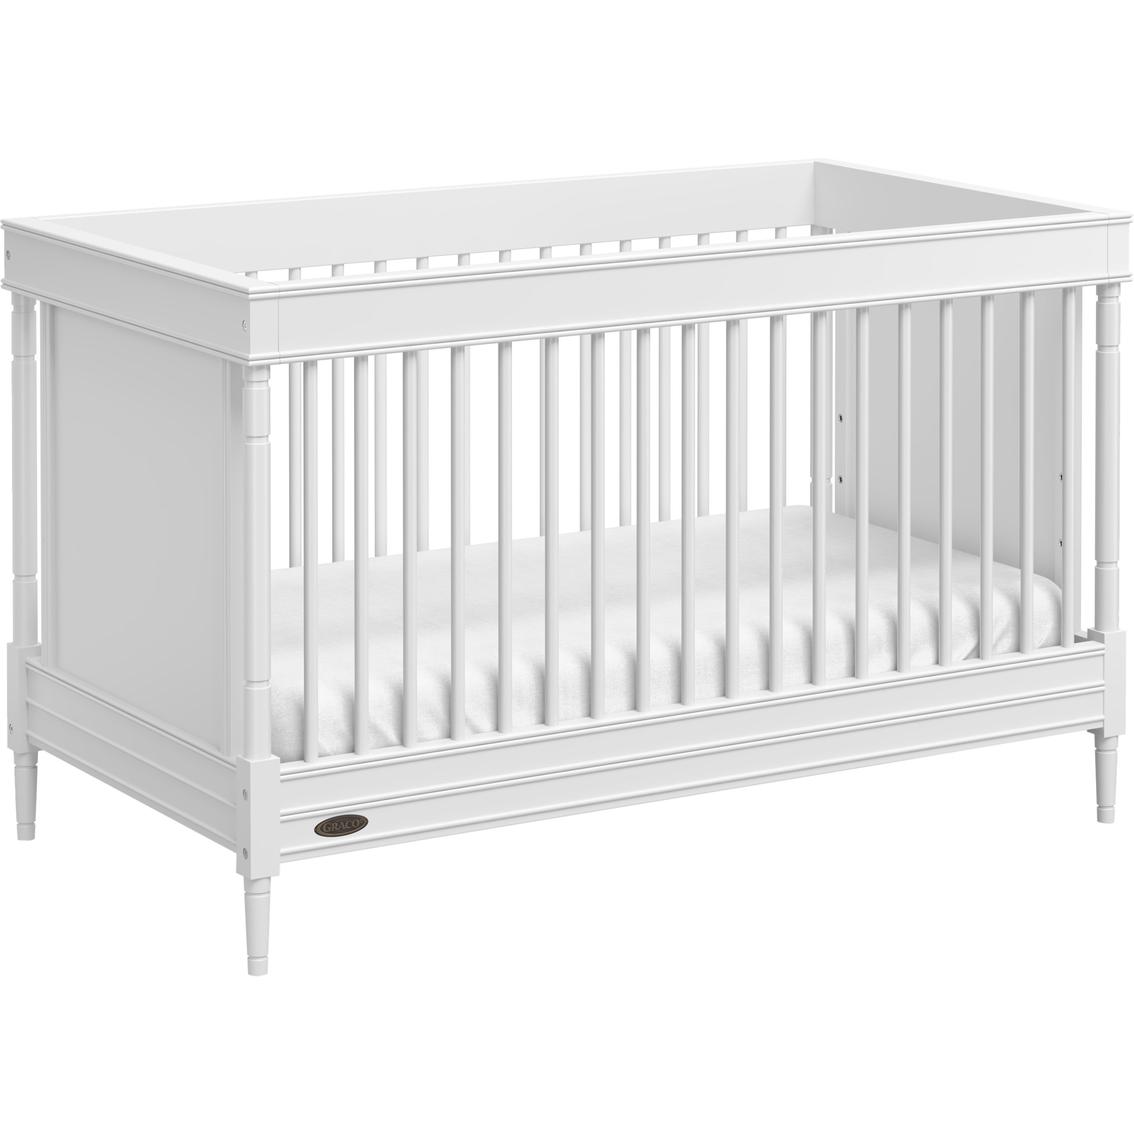 Graco Ashleigh 3 In 1 Convertible Crib Cribs Baby Toys Shop The Exchange